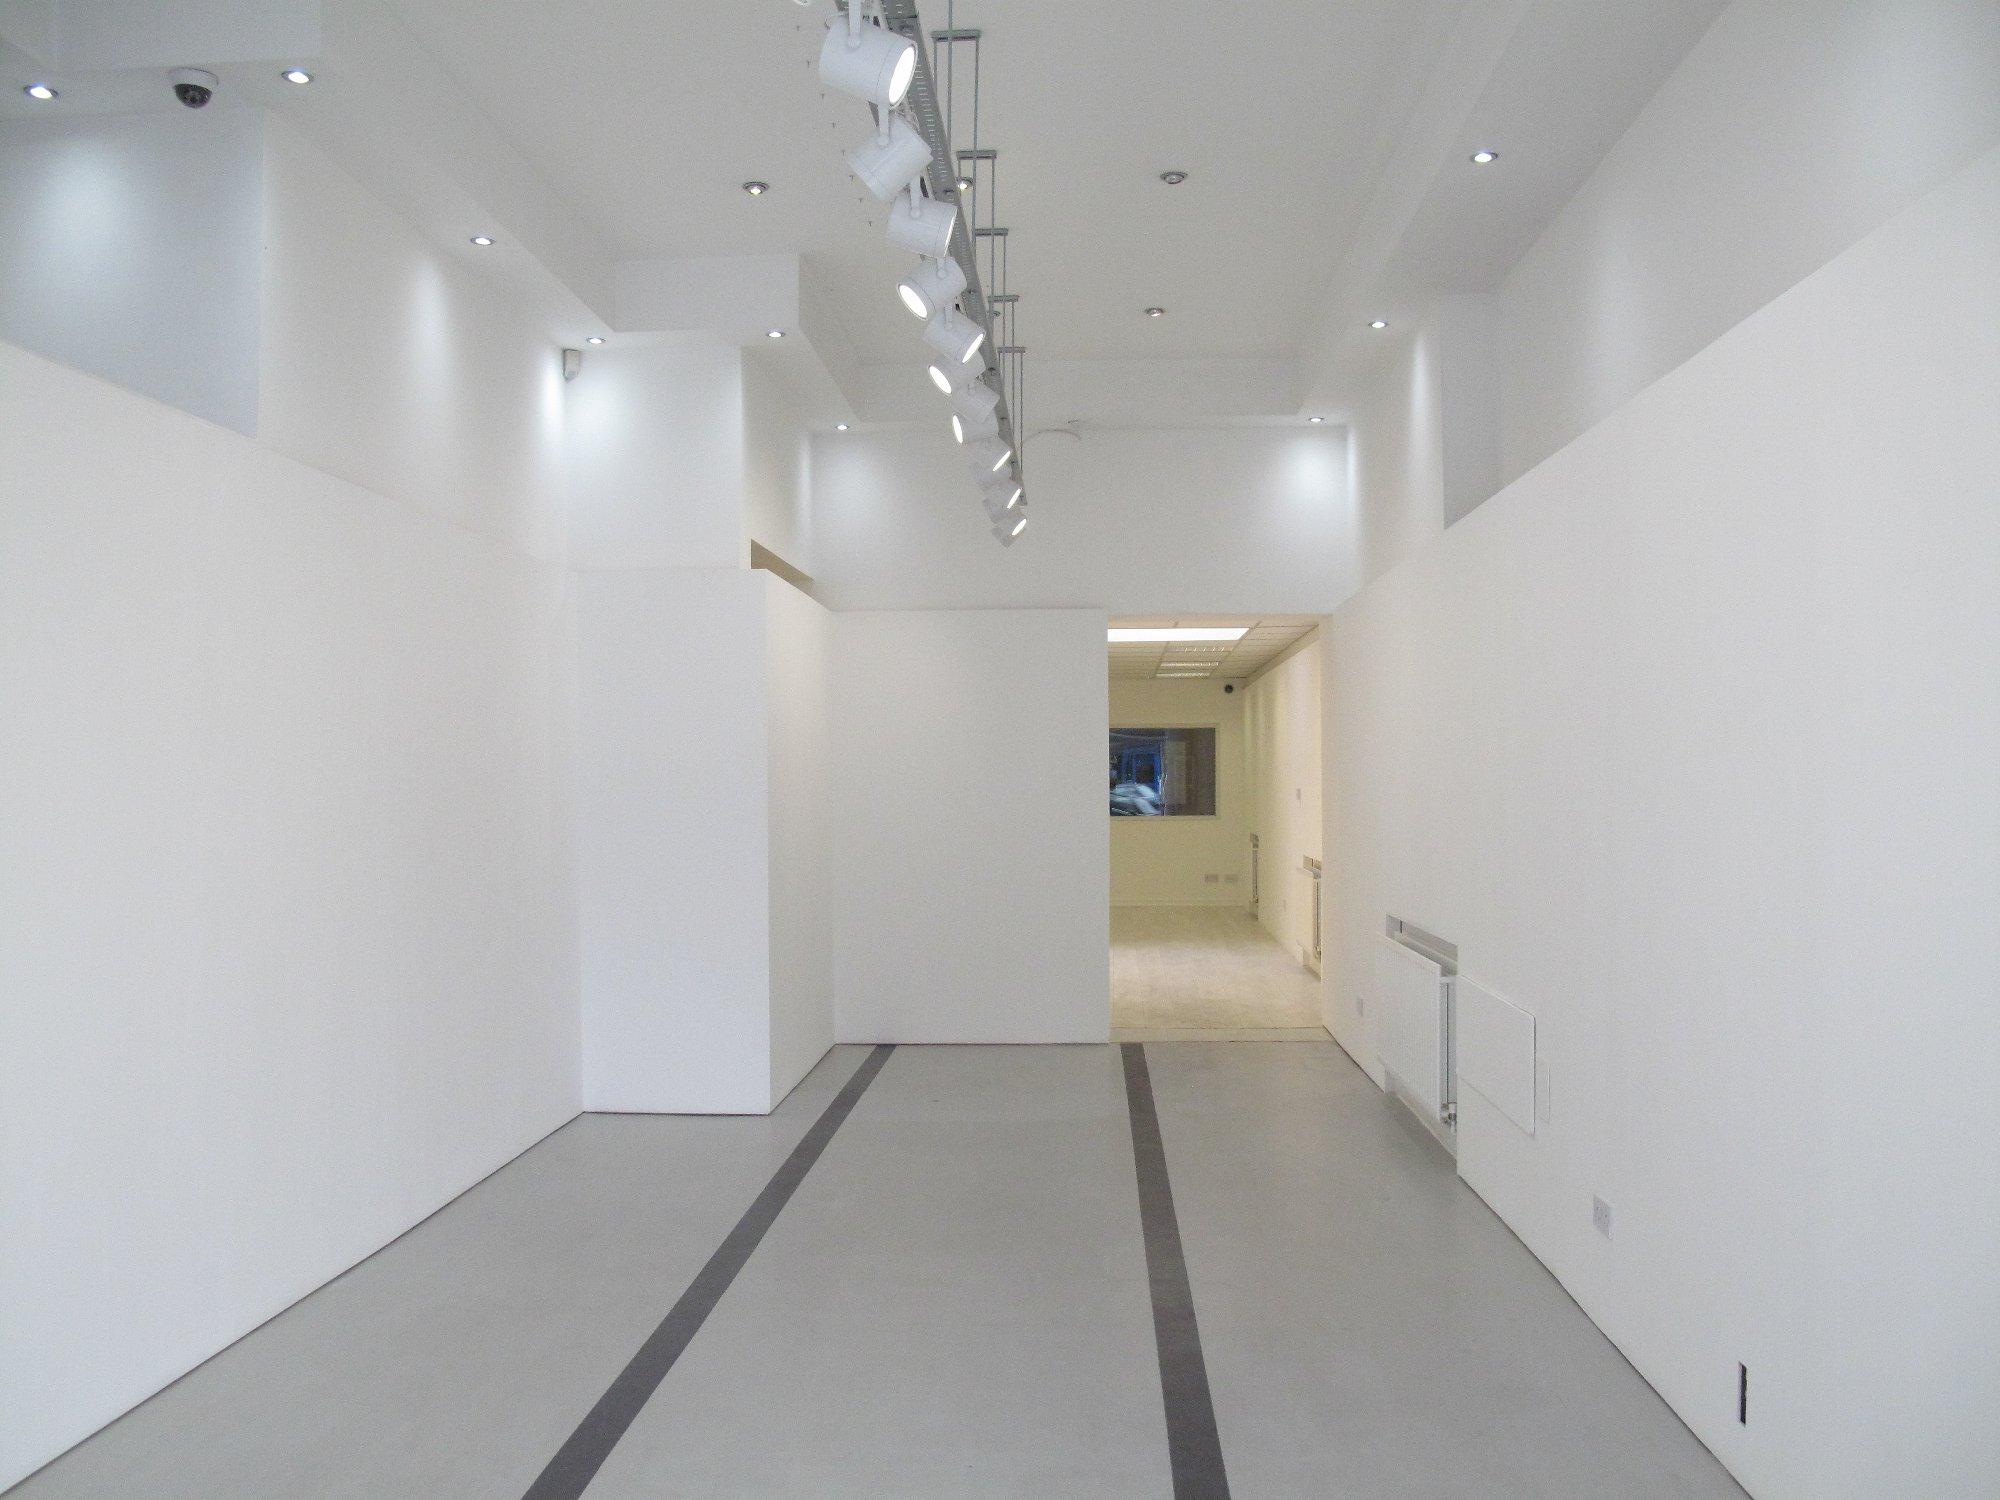 02 - Offshoot Gallery - Front.JPG